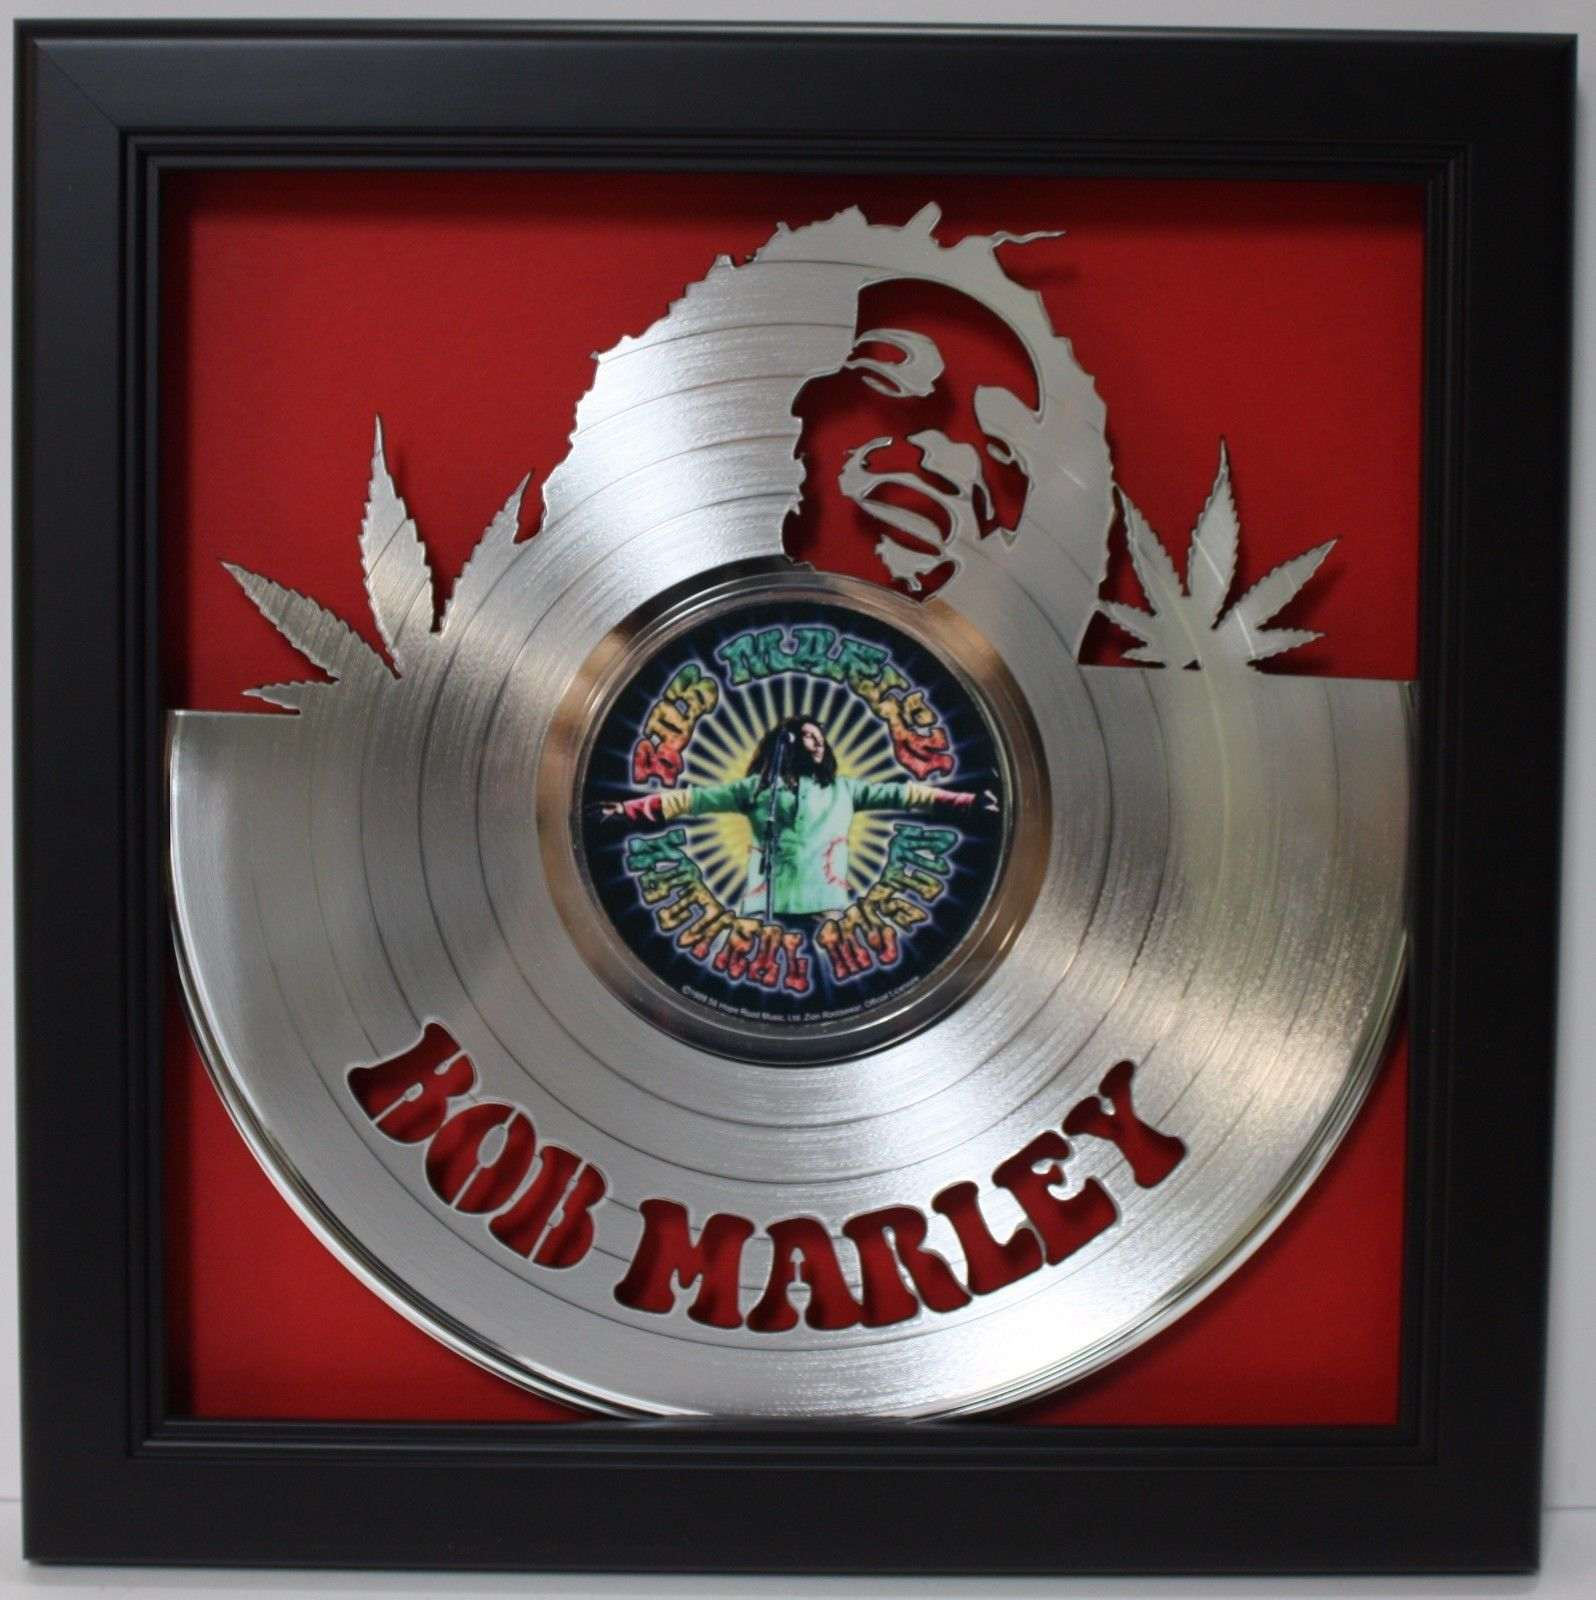 Shadow Box Wall Art bob marley 2 framed laser cut platinum vinyl record in shadowbox